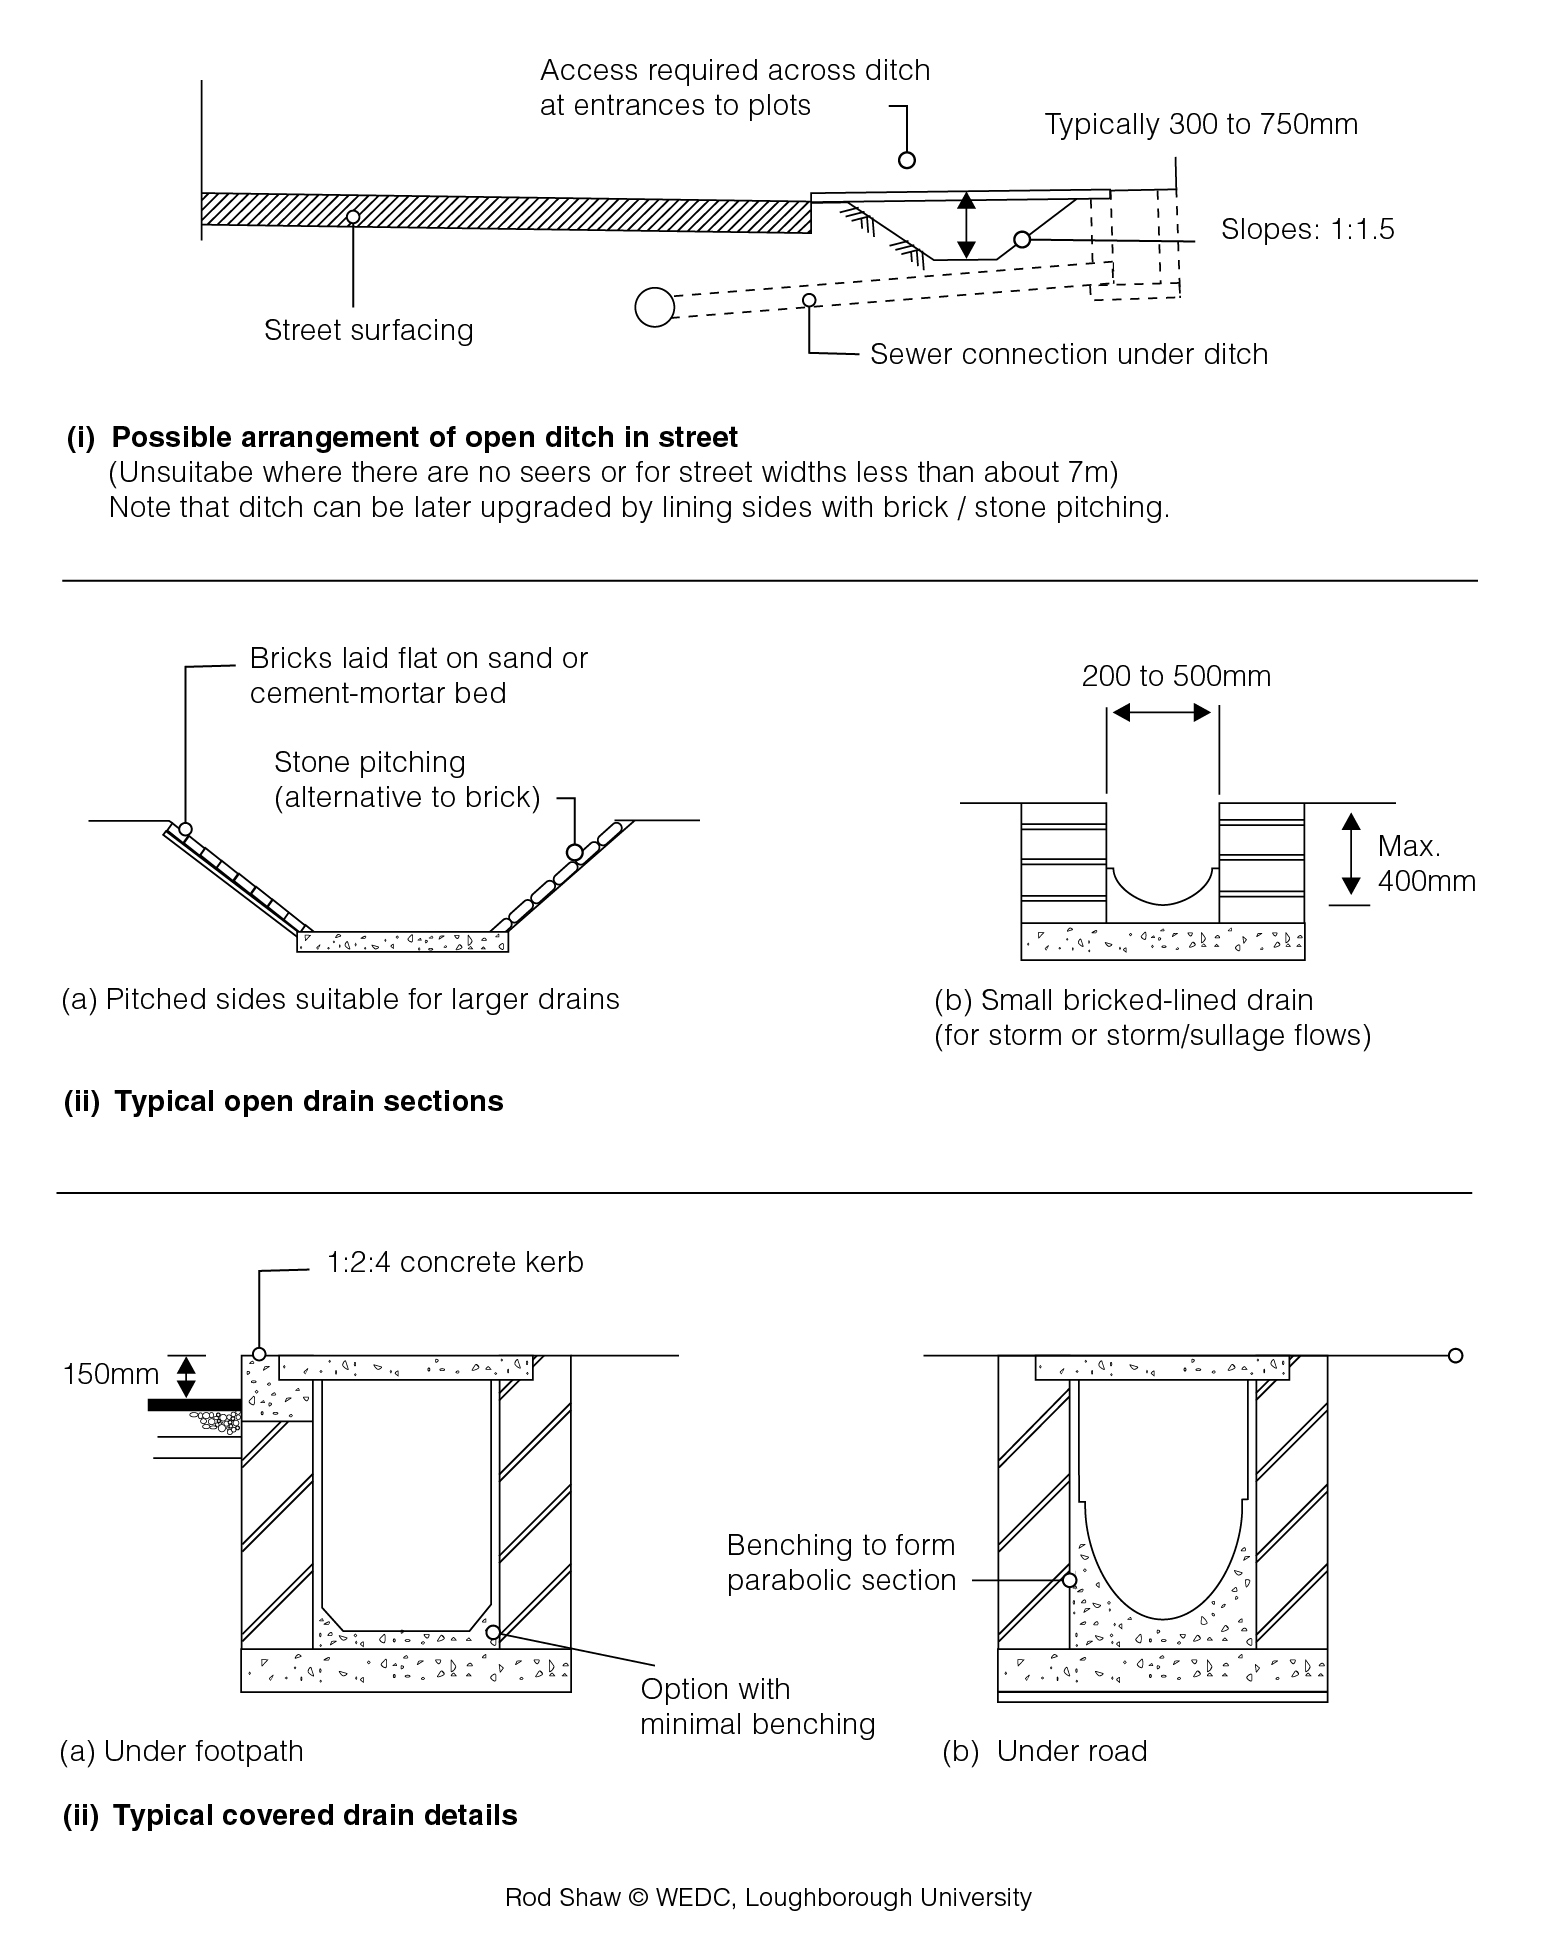 Drainage Channel Diagram Scott Riding Mower Wiring Diagram S on distributor schematic, humbucker pickup electrical schematic, delco alternator schematic,